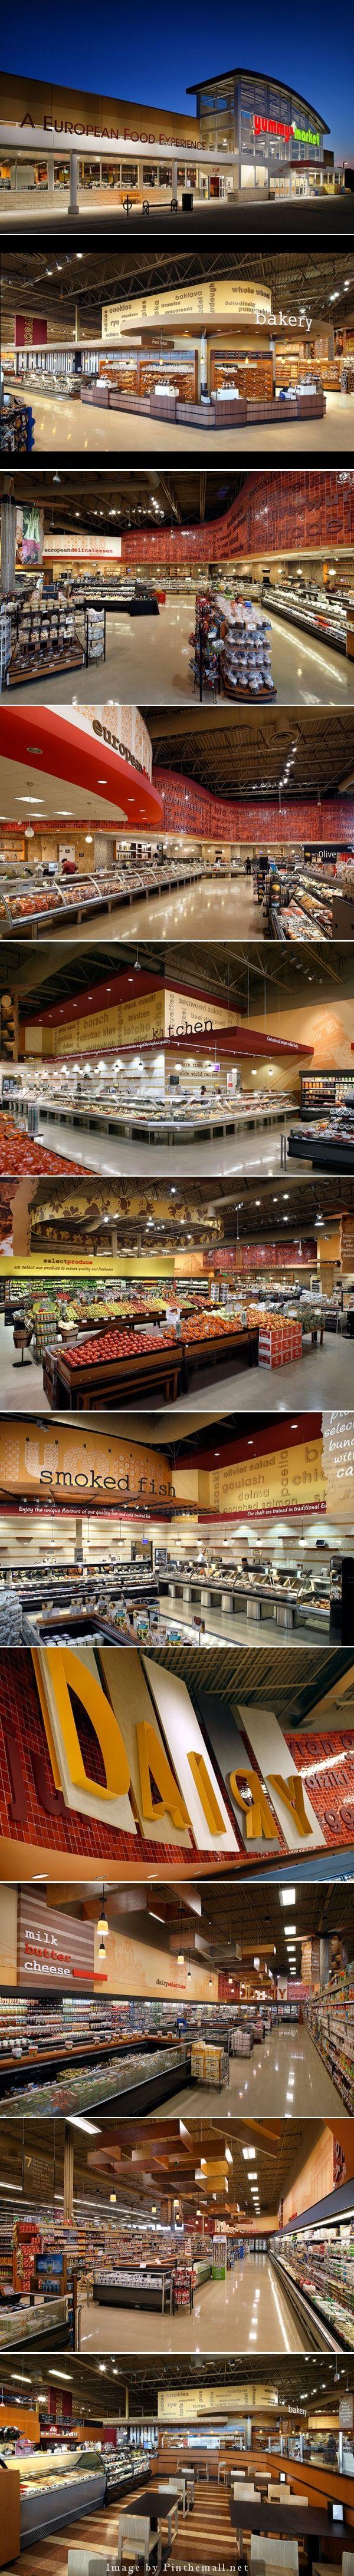 Yummy Market, Toronto - created on 2014-09-14 06:21:24